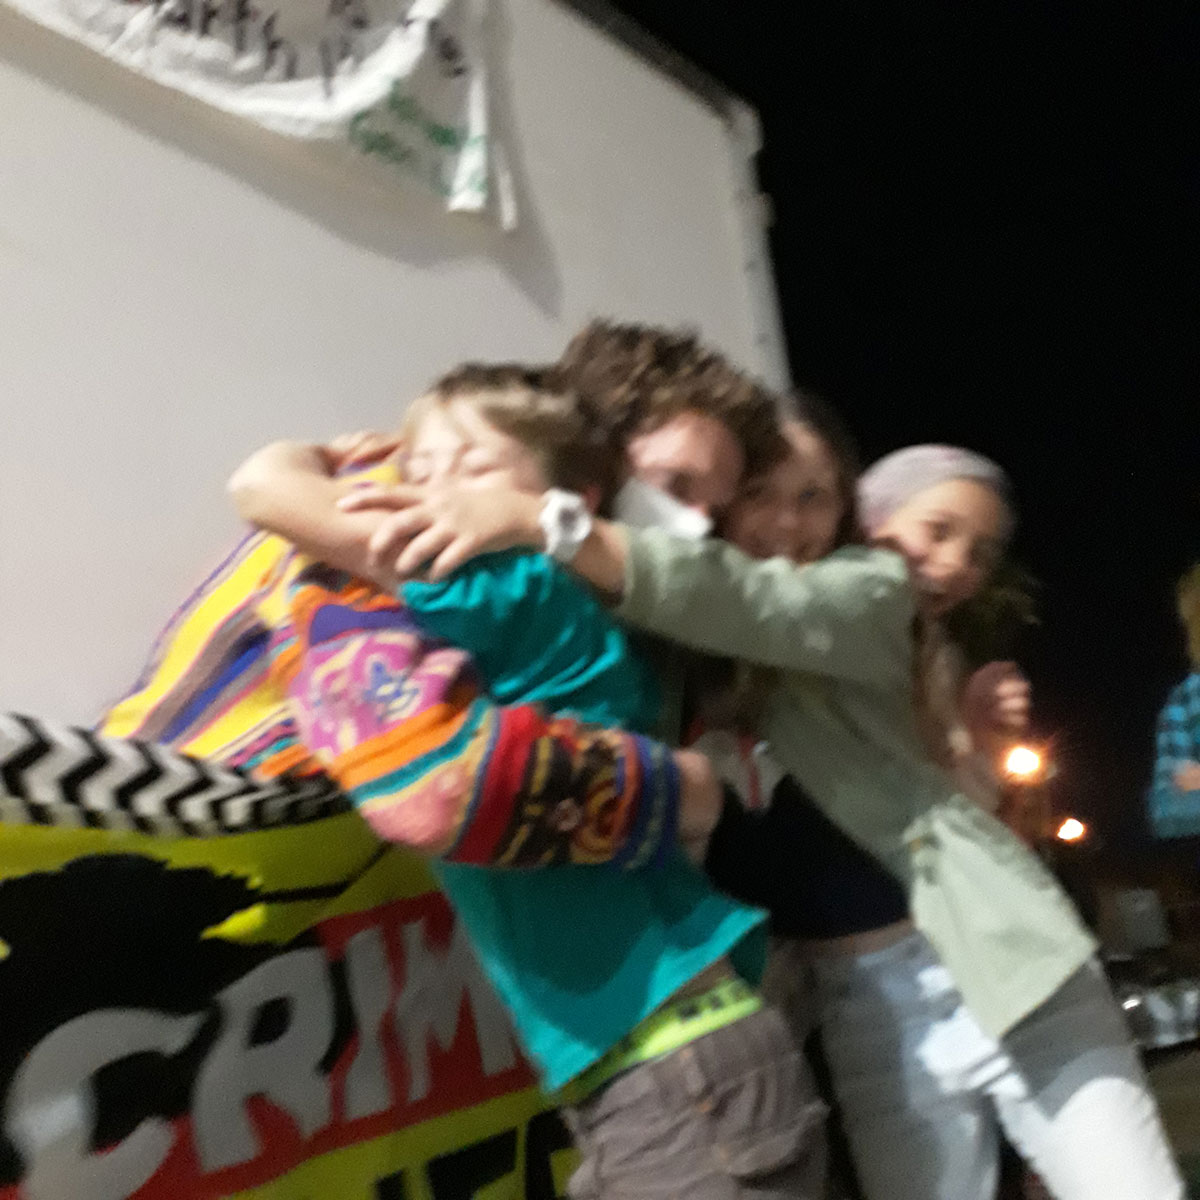 franz hug truck kids action